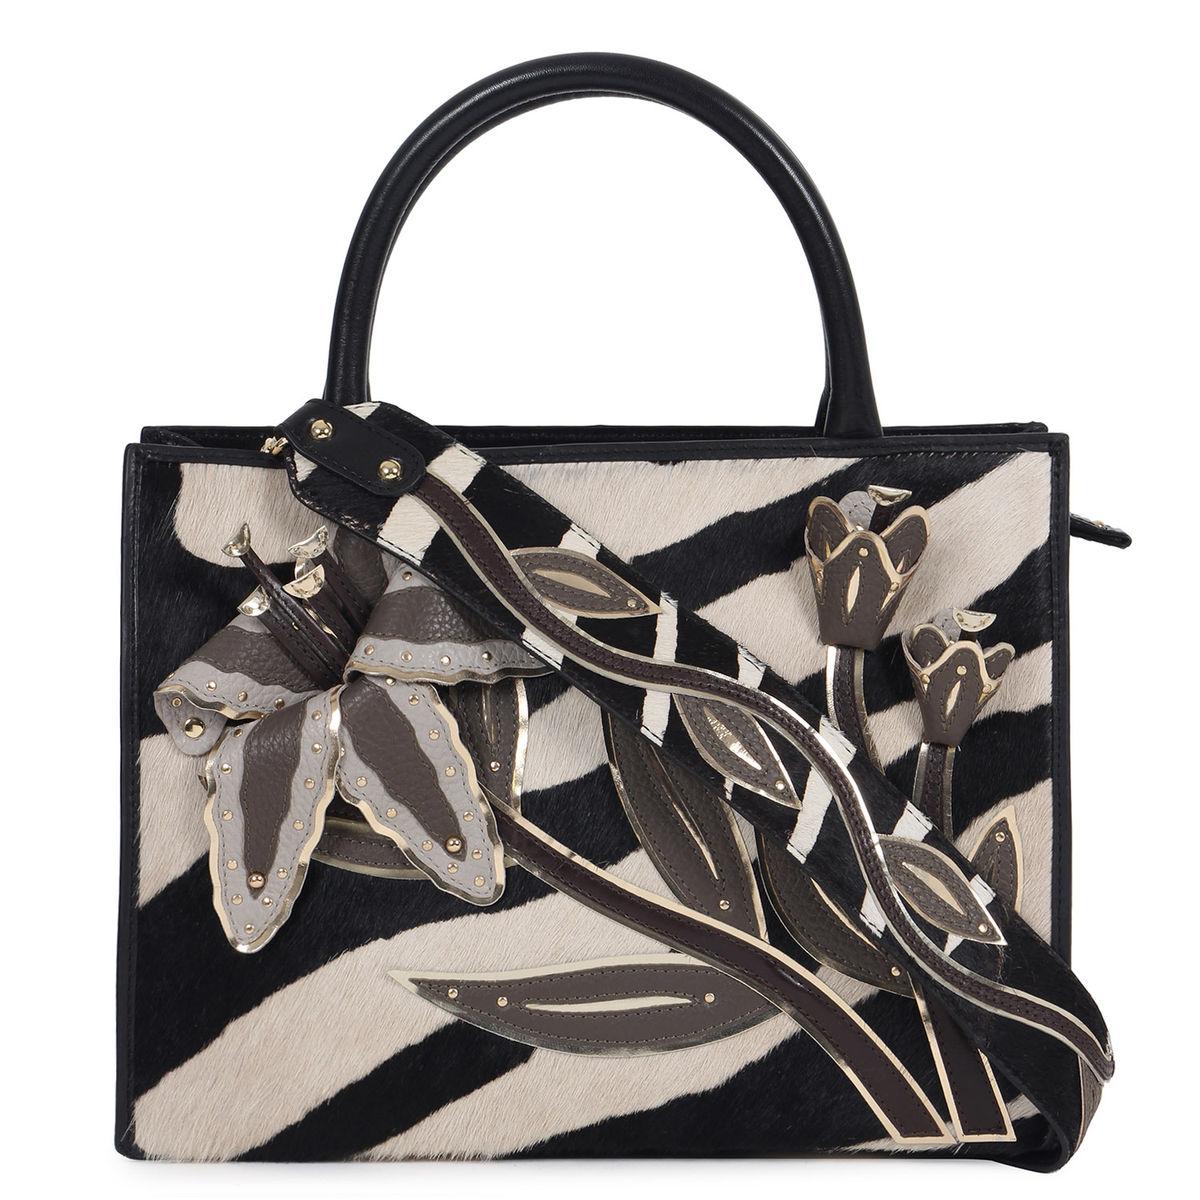 6881b89540 ... Da Milano Black White Top Handle Bag · zoom ...